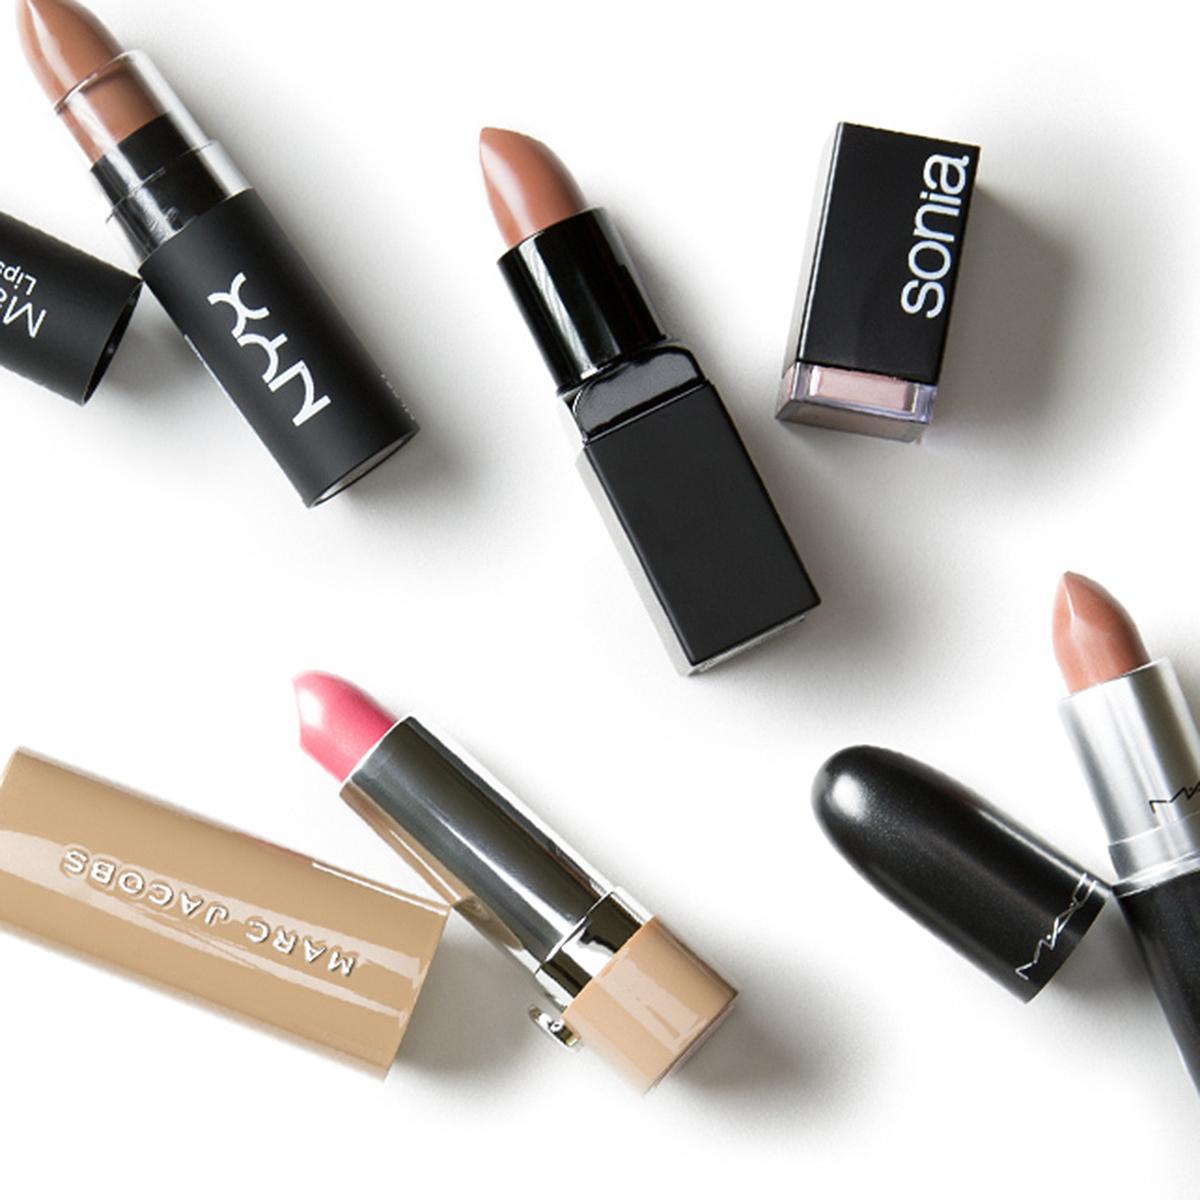 I love good nude lip, dolls! Shop my faves here: http://t.co/tYKzmiZ4Km http://t.co/cbm2vVZdDe